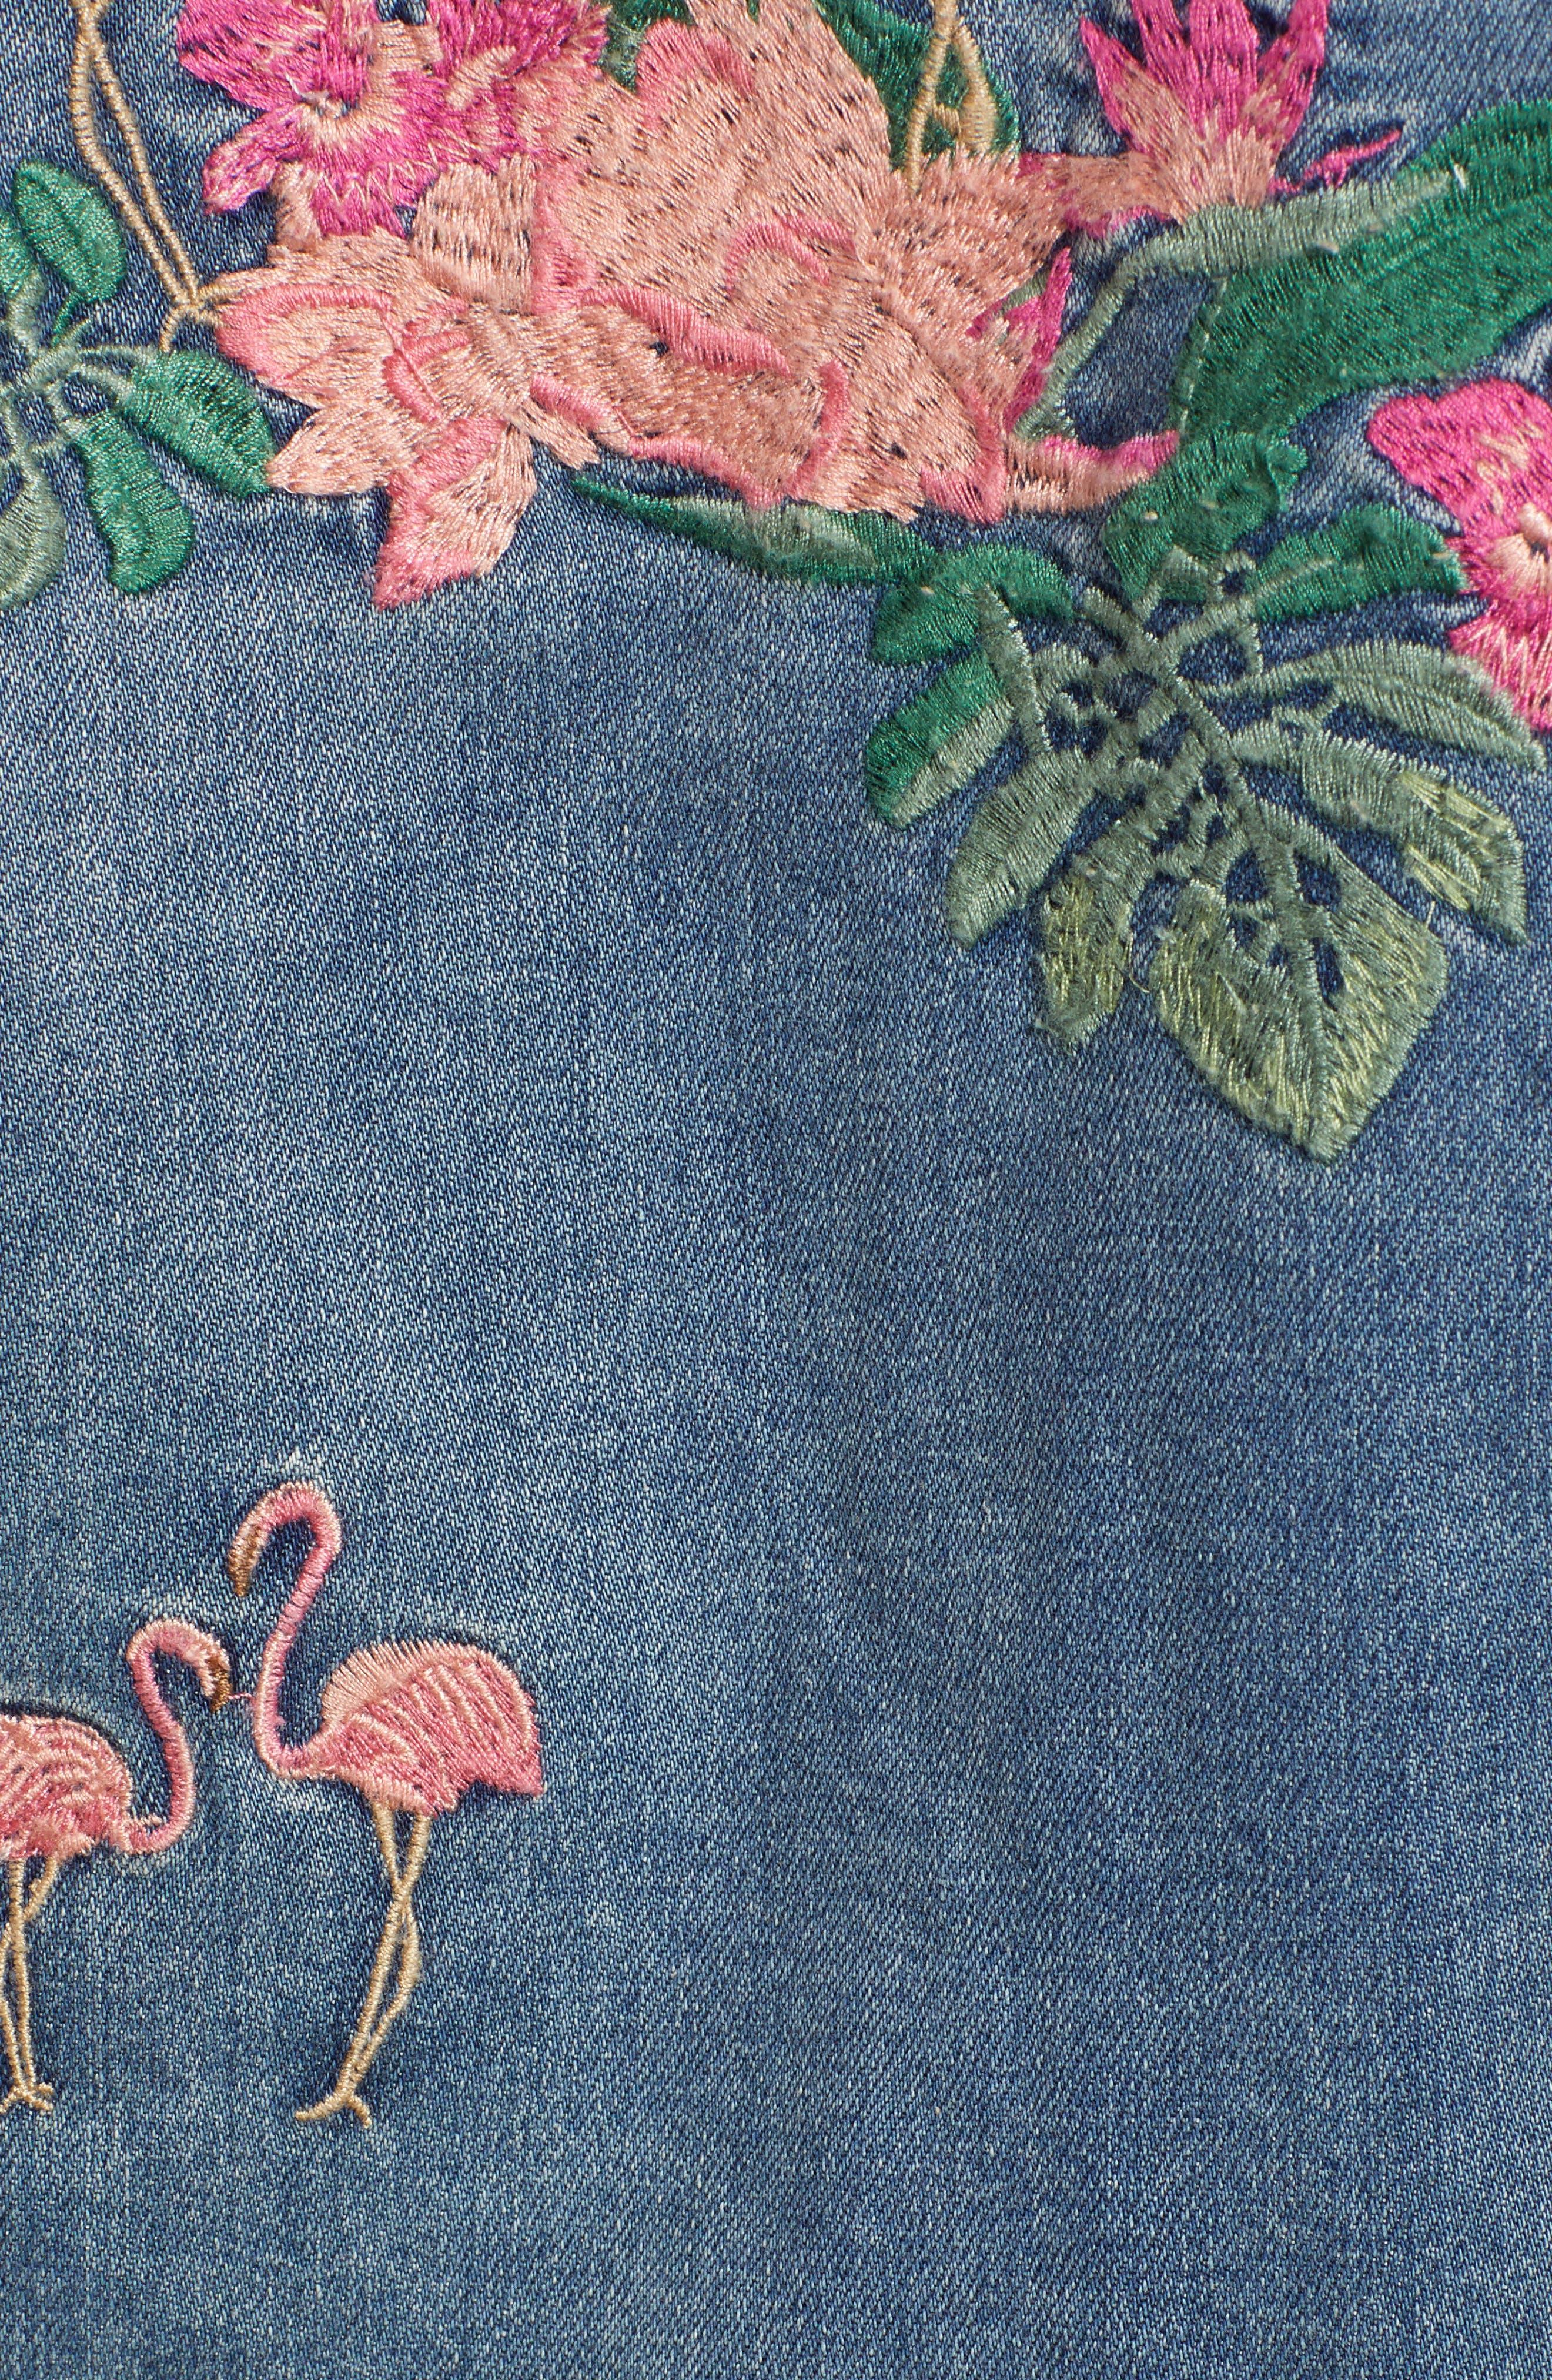 Flamingo Embroidered Denim Jacket,                             Alternate thumbnail 6, color,                             Blue W/ Embroider